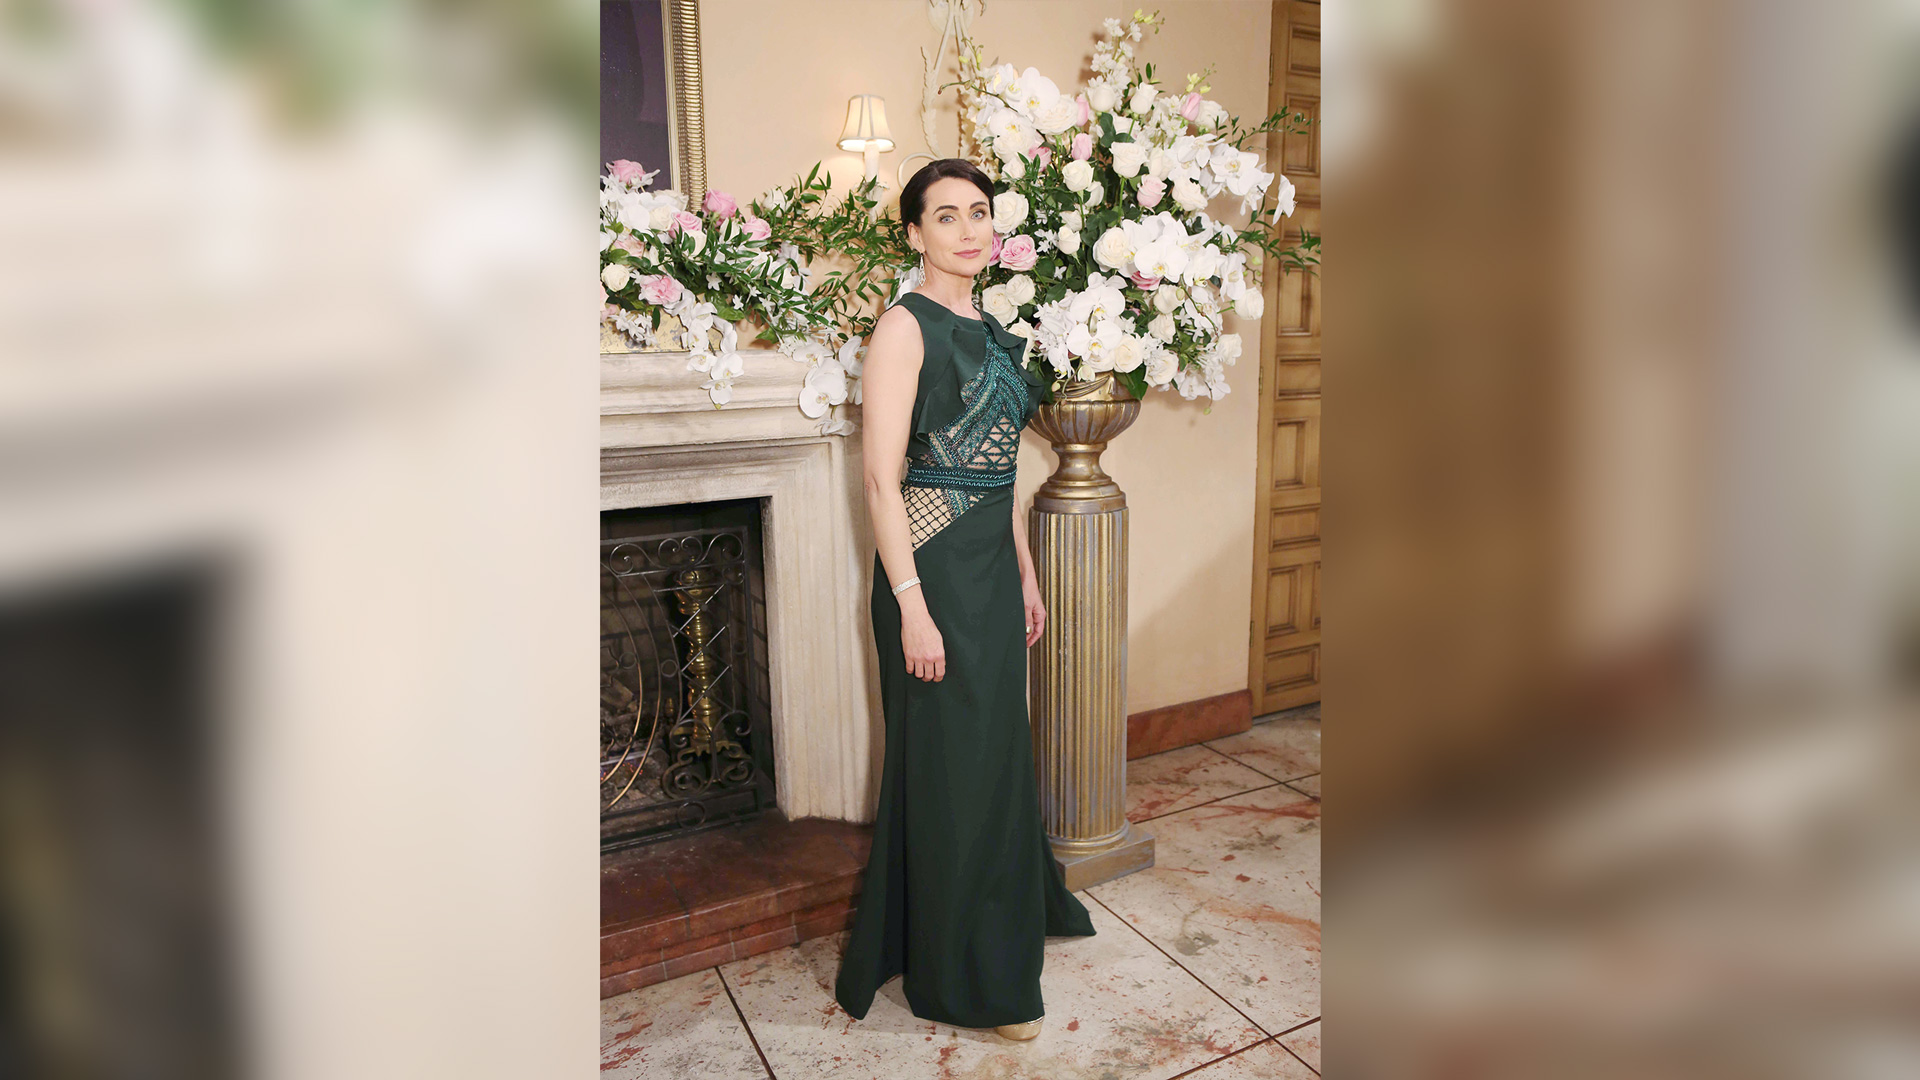 Quinn Fuller (Rena Sofer) dazzles in green.